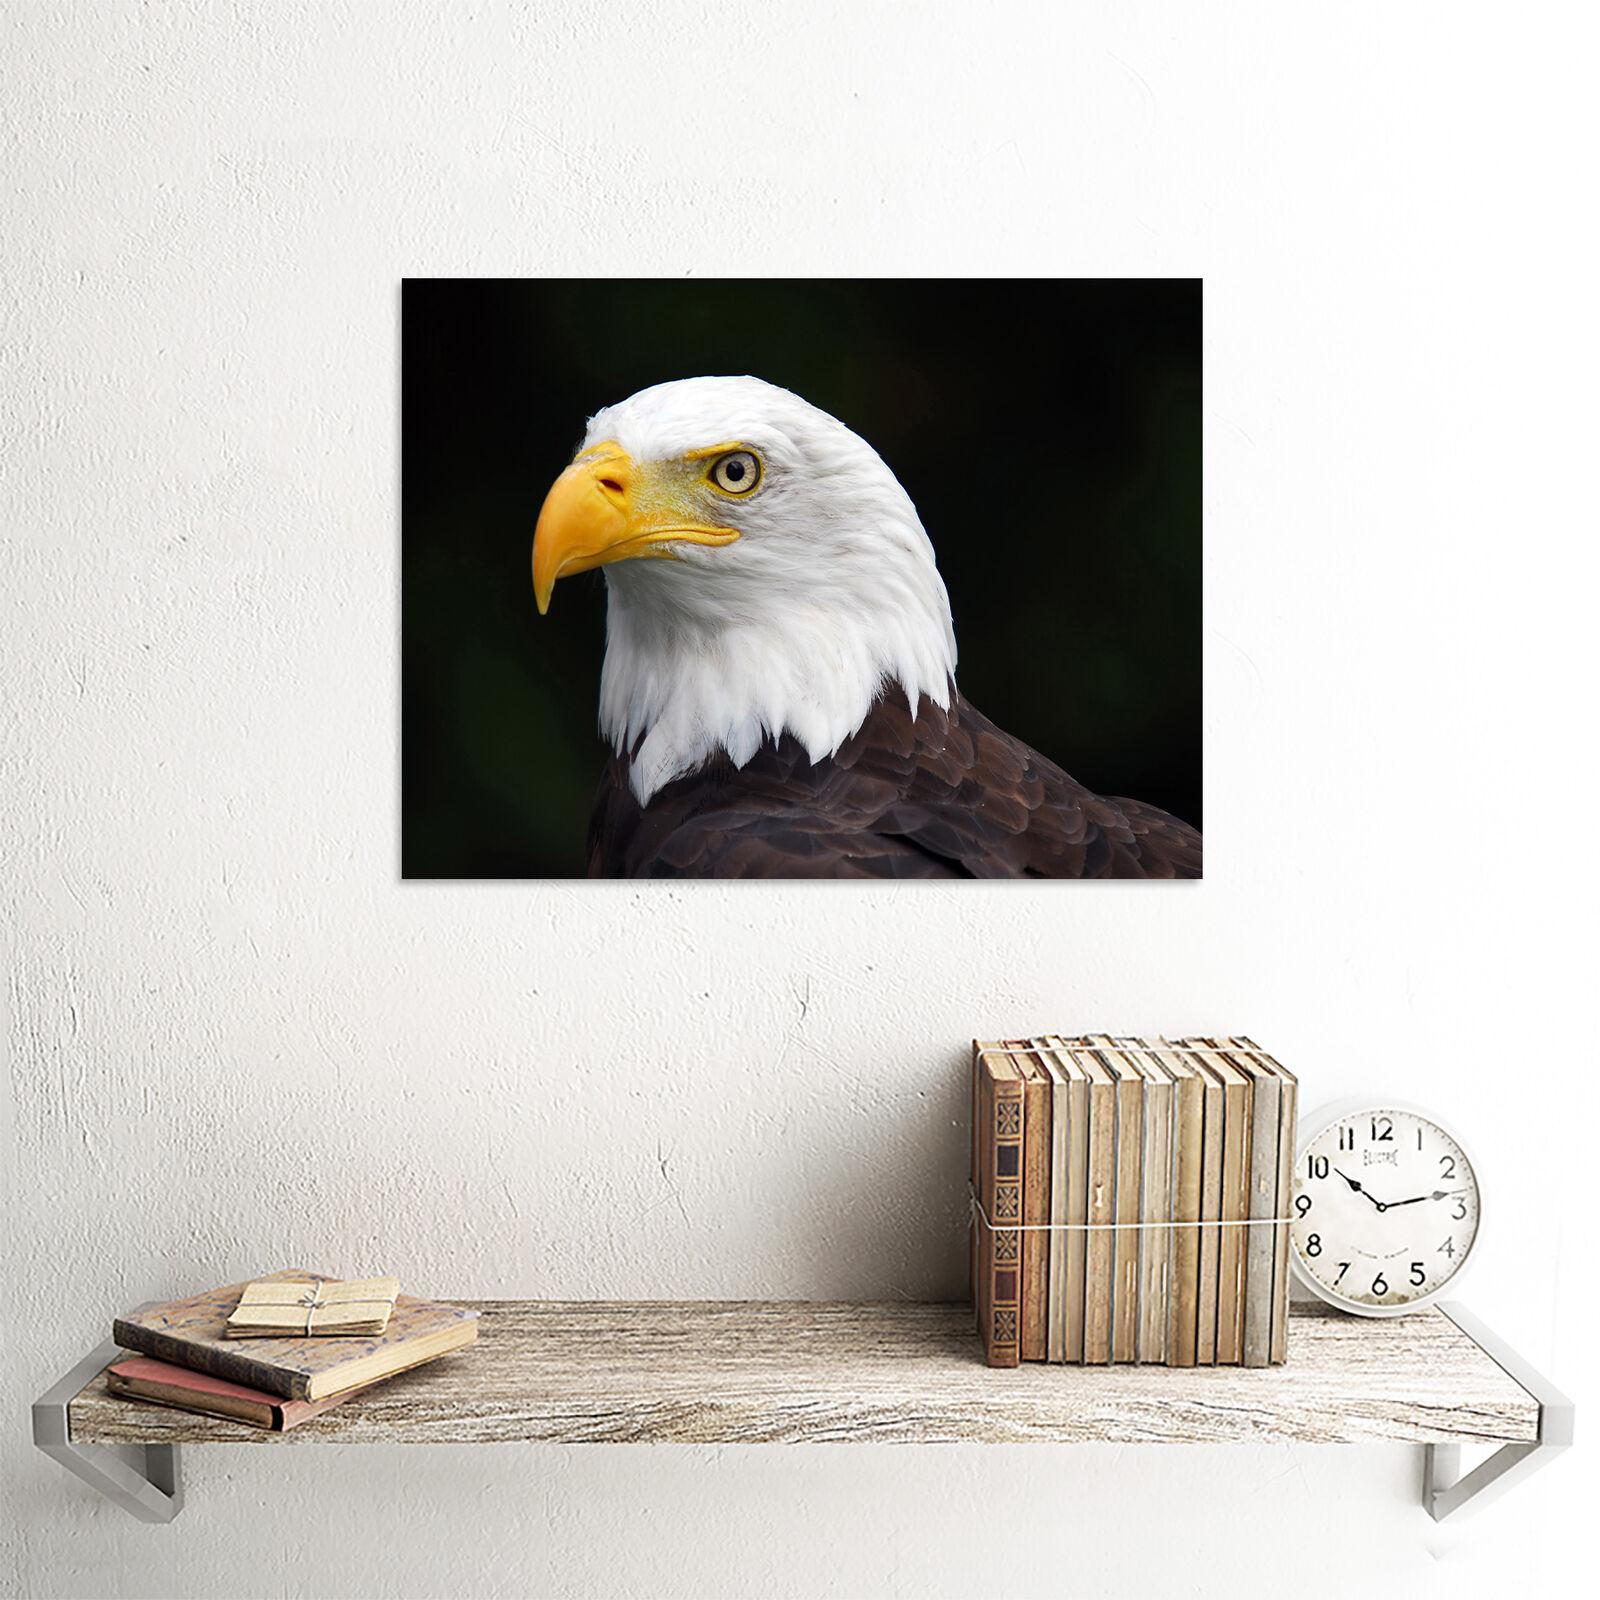 AMERICAN BALS EAGLE BIRD PORTRAIT PHOTO ART PRINT POSTER PICTURE BMP1750B